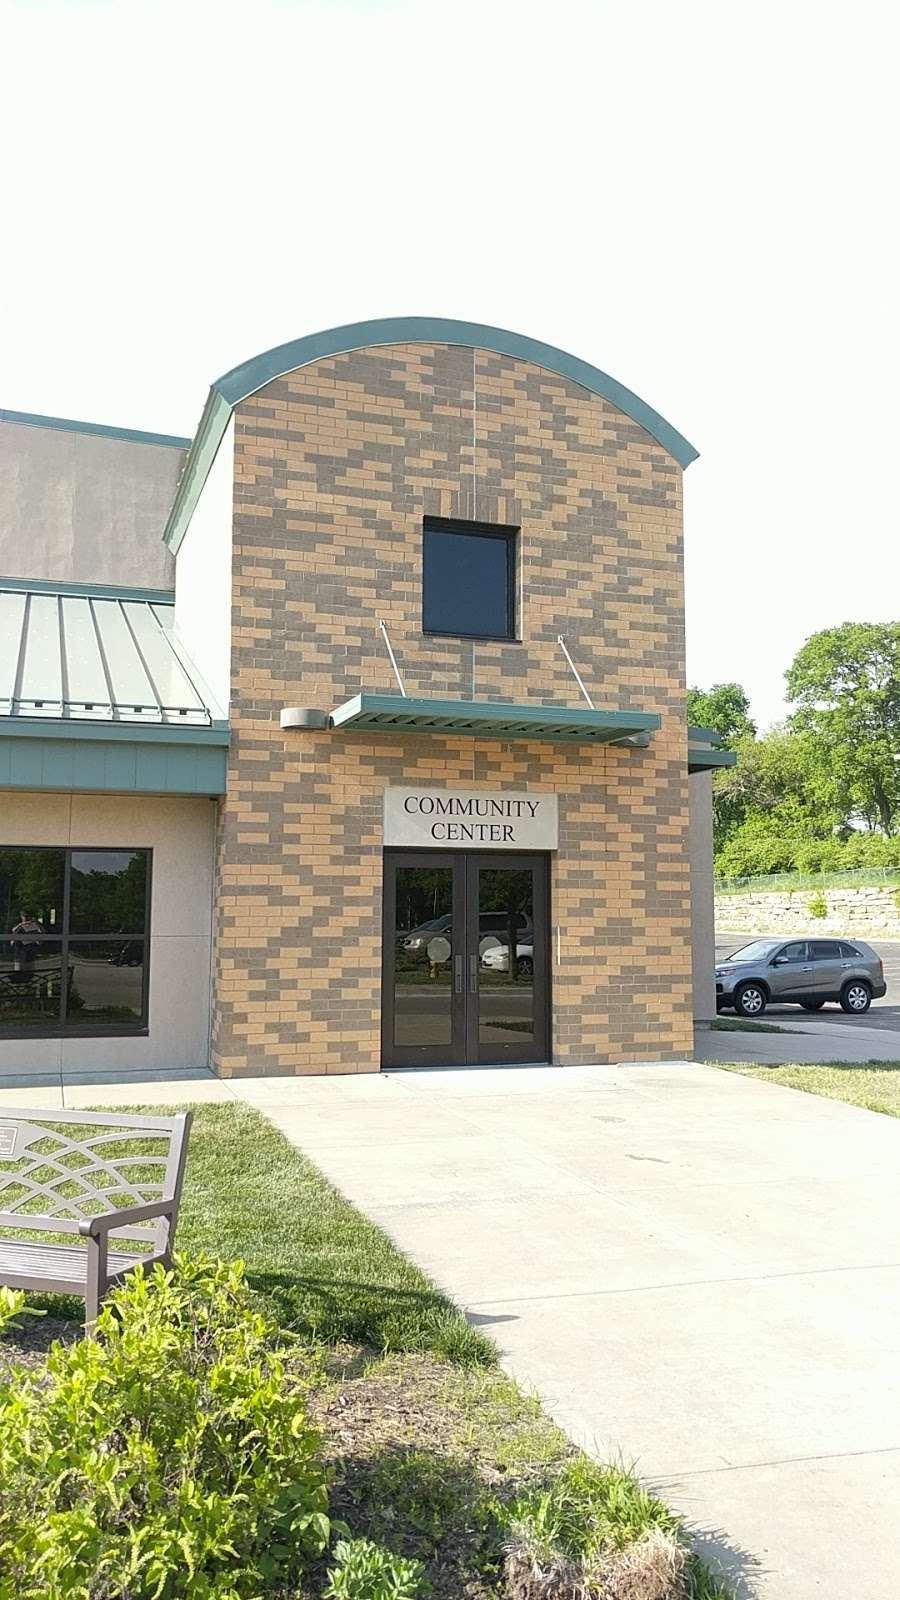 Good Shepherd Catholic Church - church  | Photo 2 of 10 | Address: 12800 W 75th St, Shawnee, KS 66216, USA | Phone: (913) 631-7116